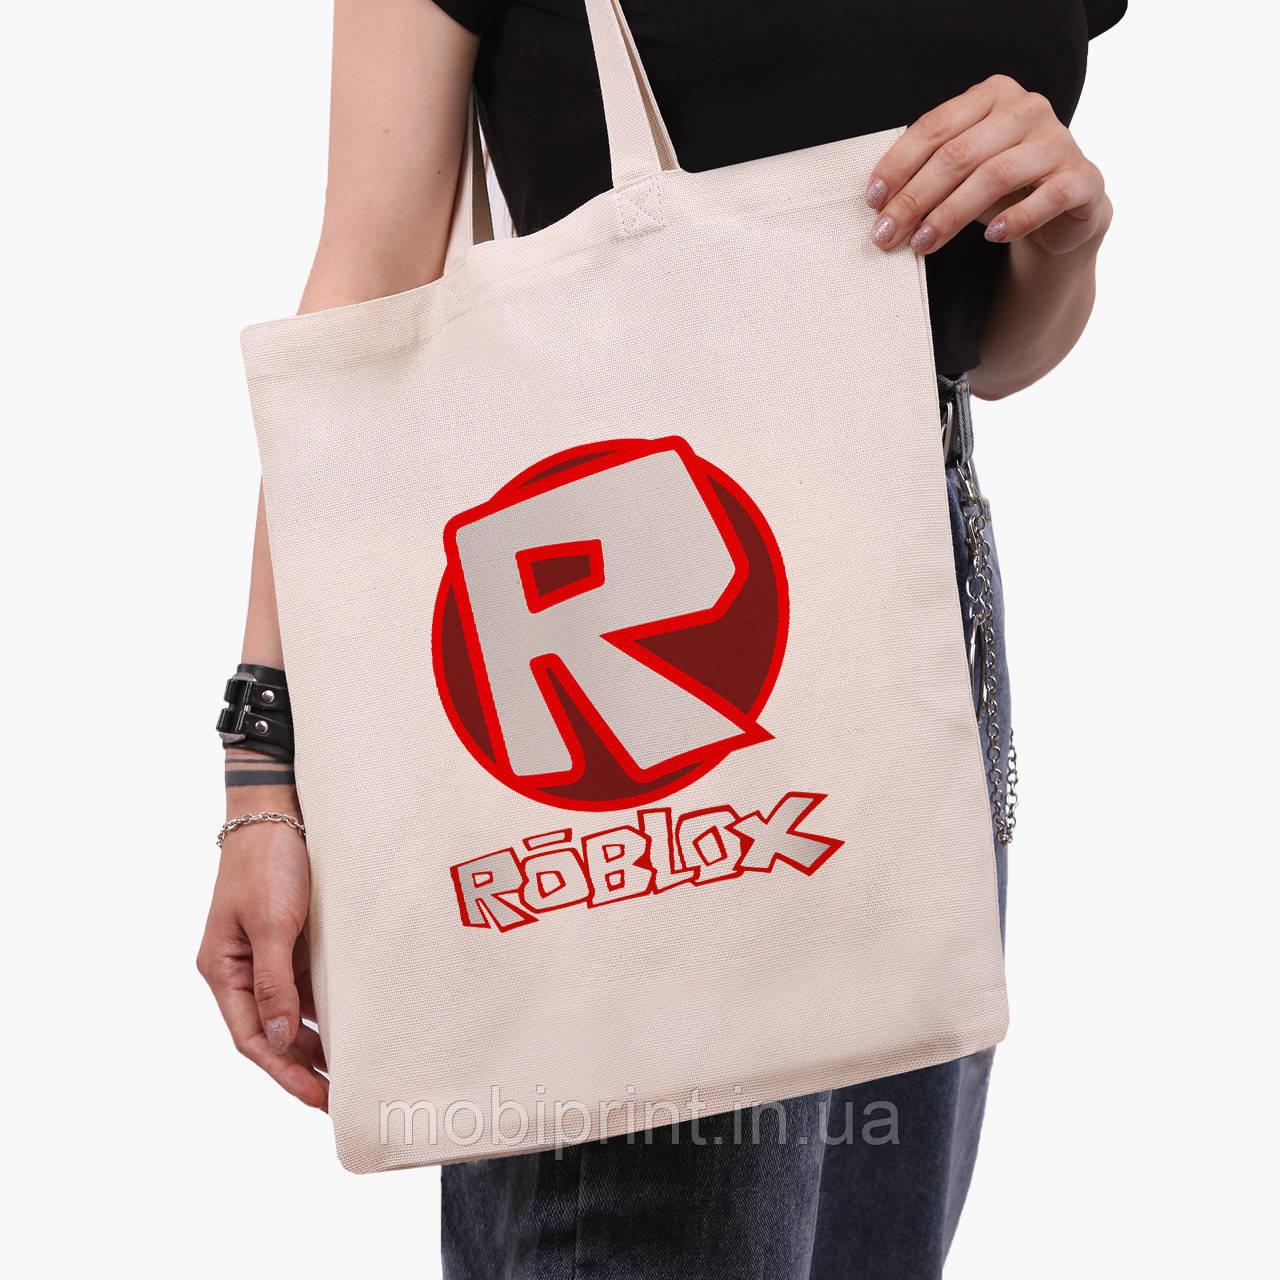 Эко сумка шоппер Роблокс (Roblox) (9227-1708)  экосумка шопер 41*35 см